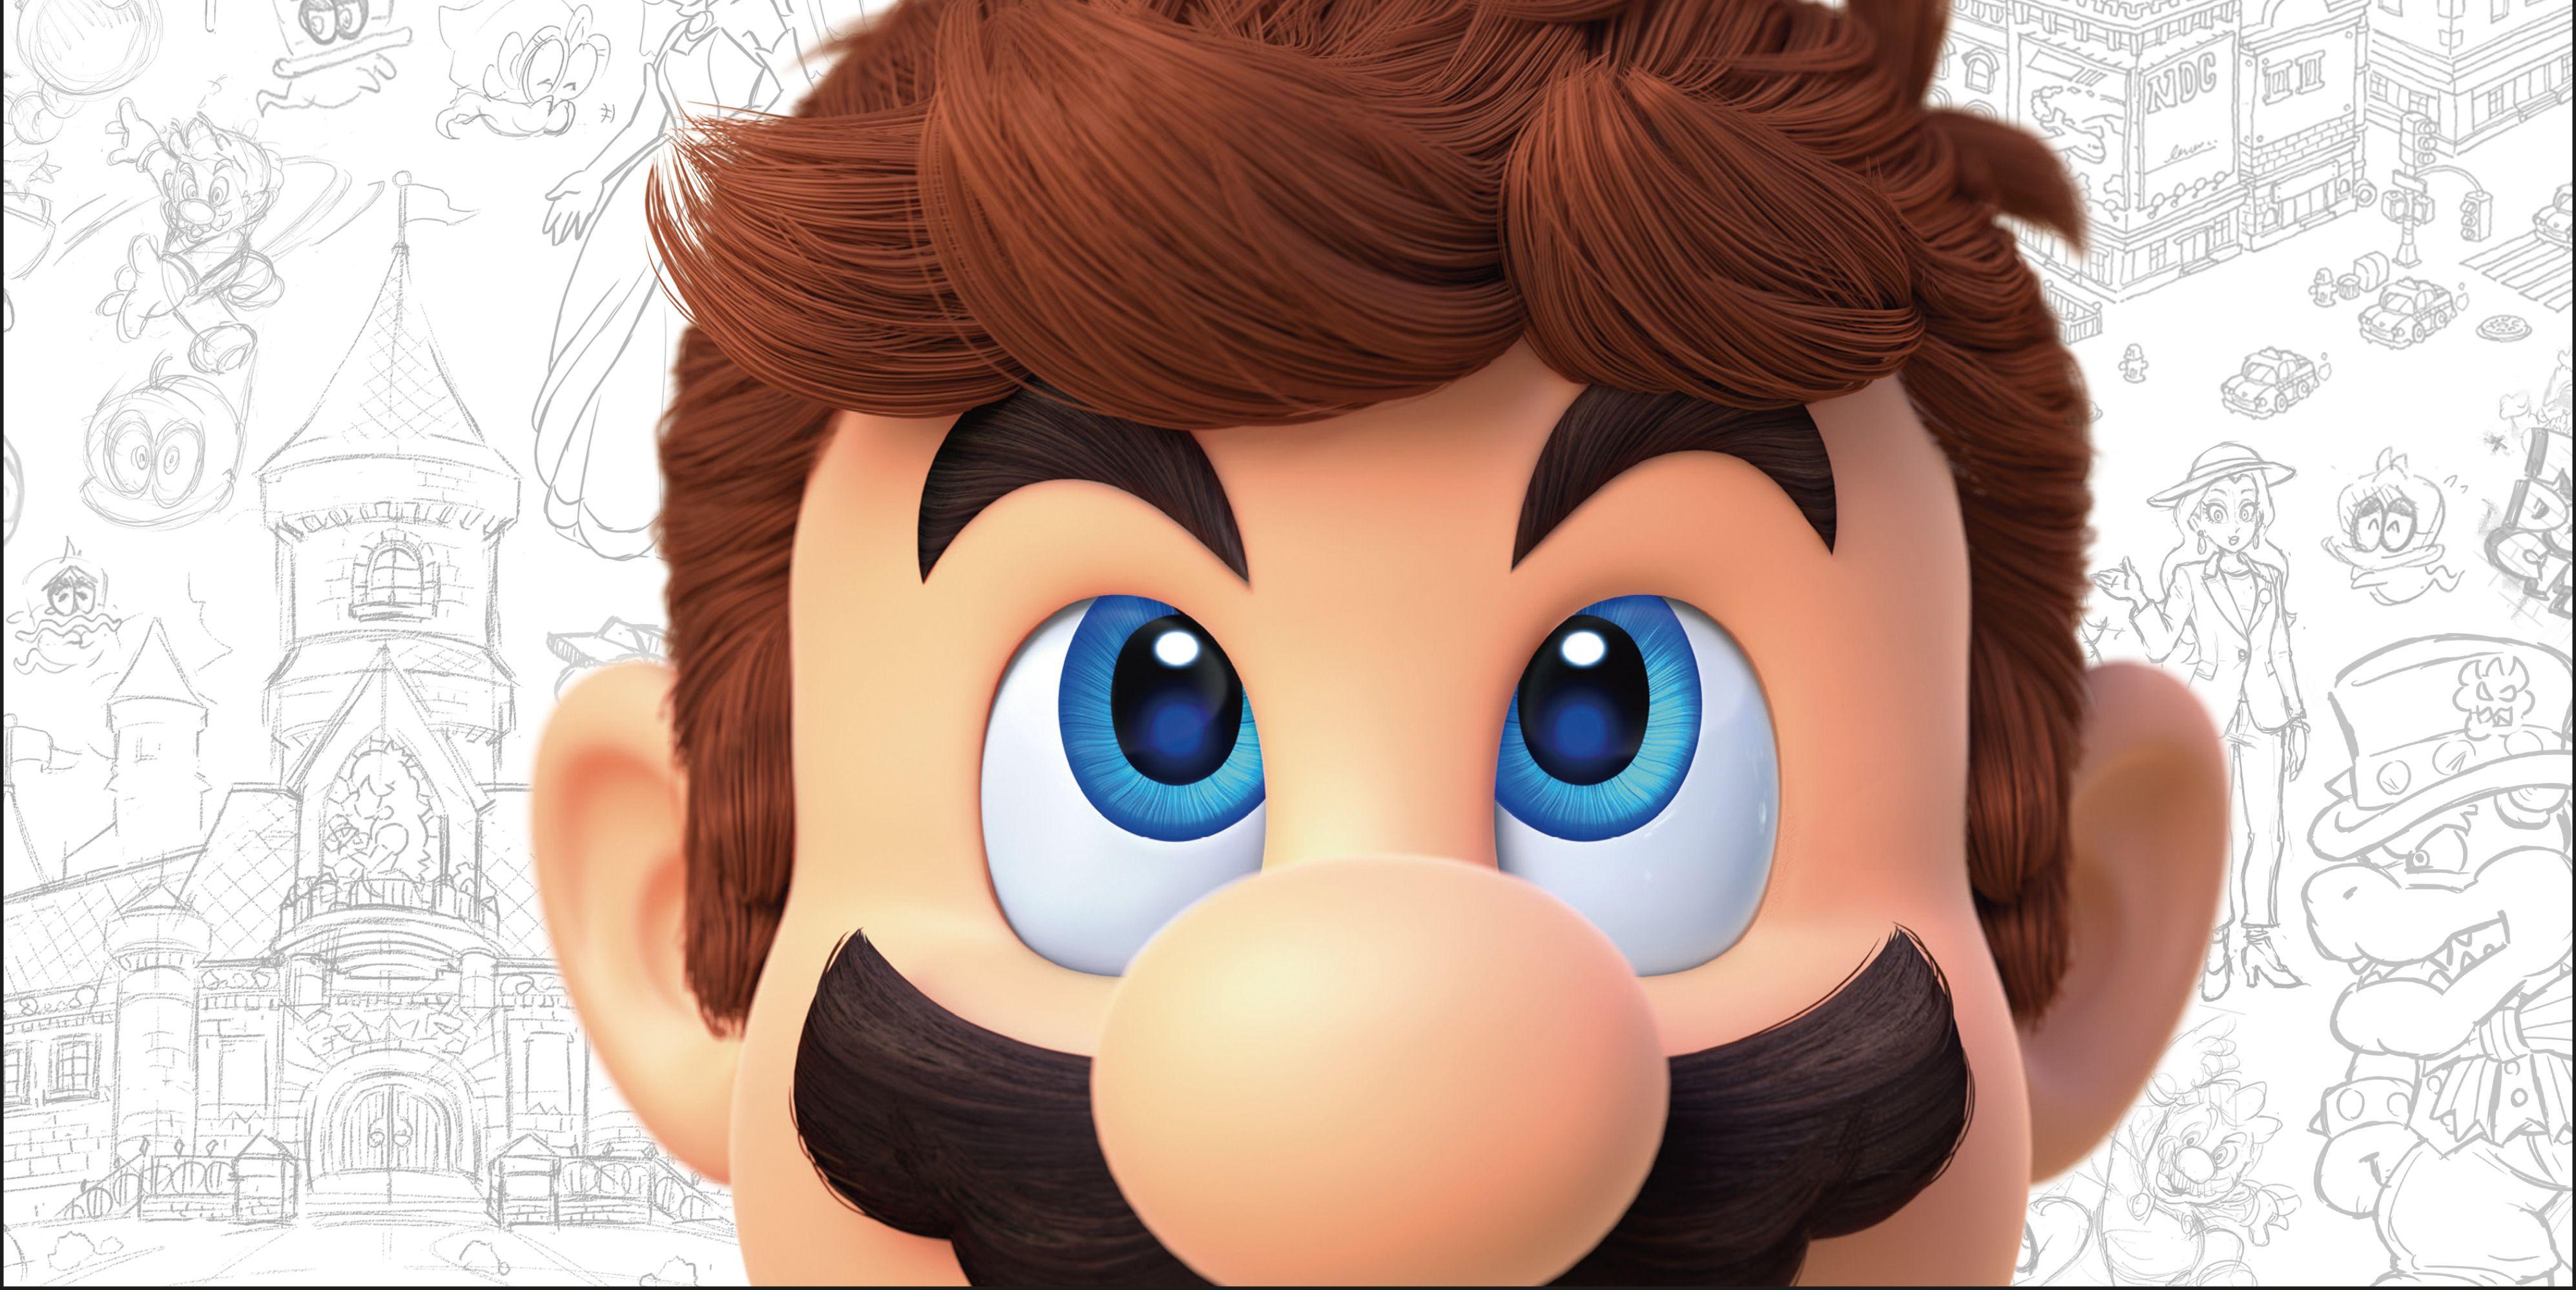 EXCLUSIVE: Mario Returns in The Art of Super Mario Odyssey Trailer